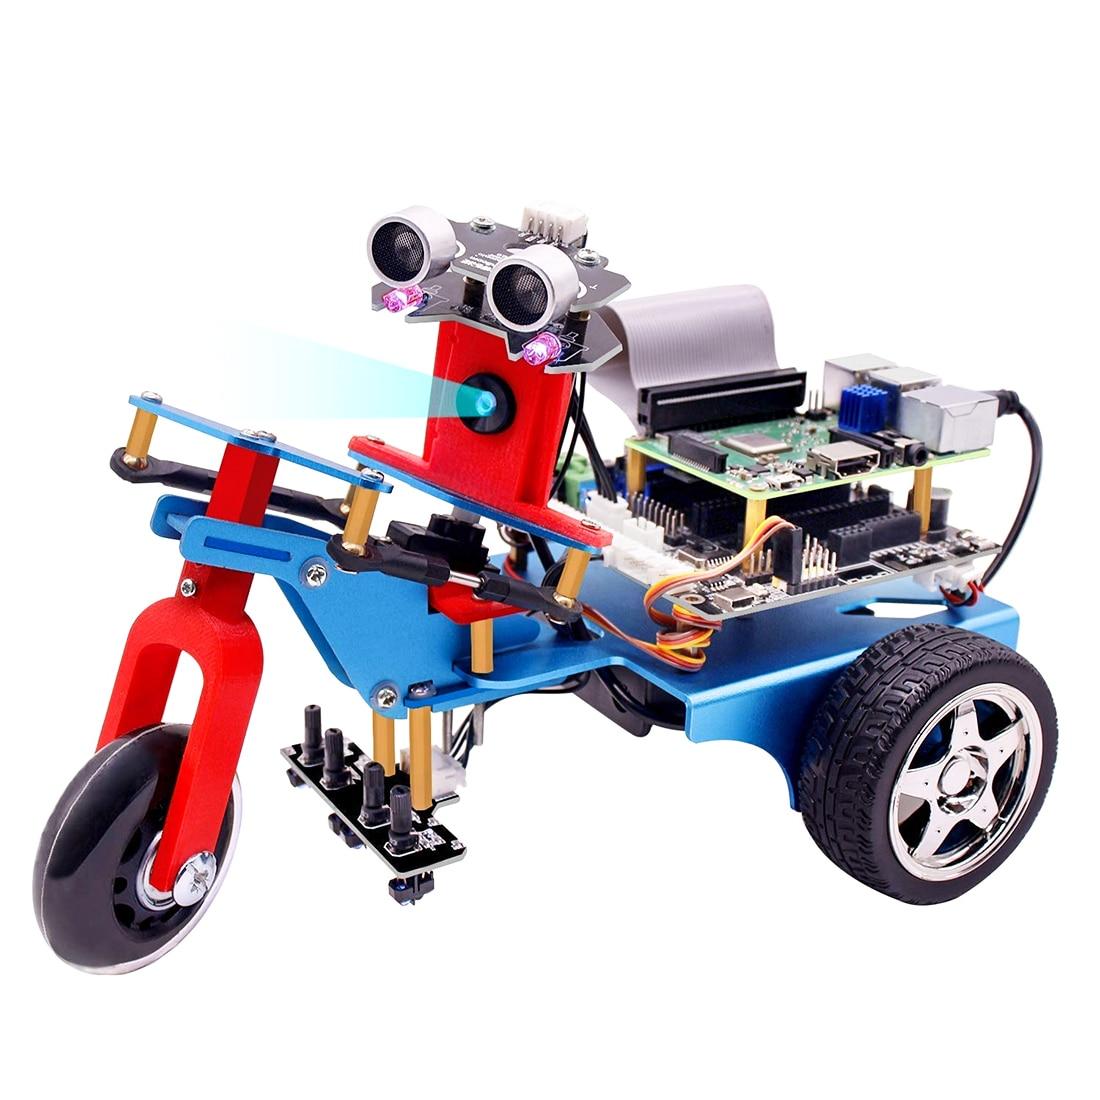 New Three-wheeled Car Shape Smart Robot Car Kit DIY Programmable Robot Kit For Raspberry4/1G